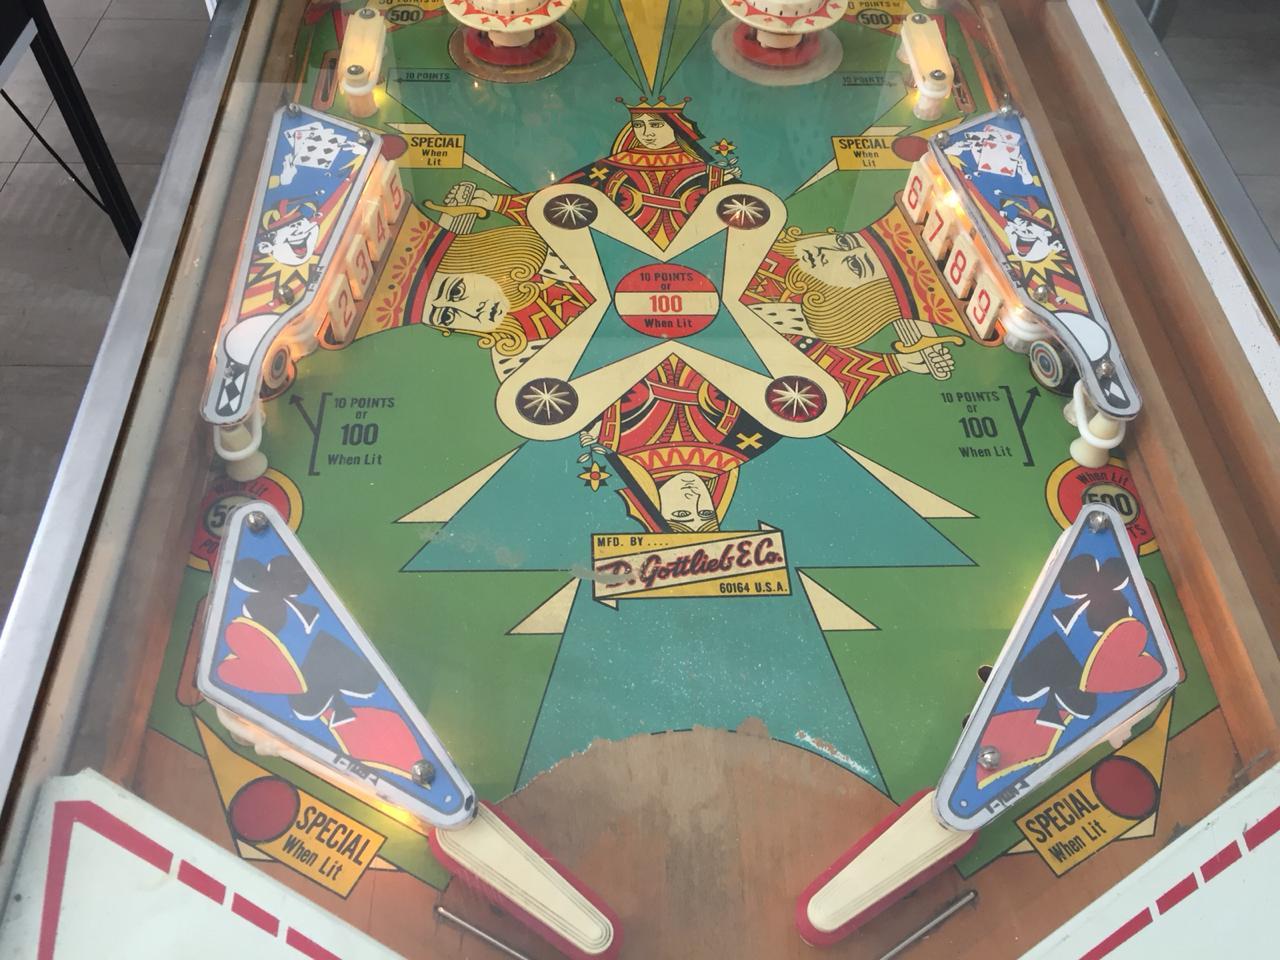 Pinball machine Drop-A-Card 1 player by Gottlieb